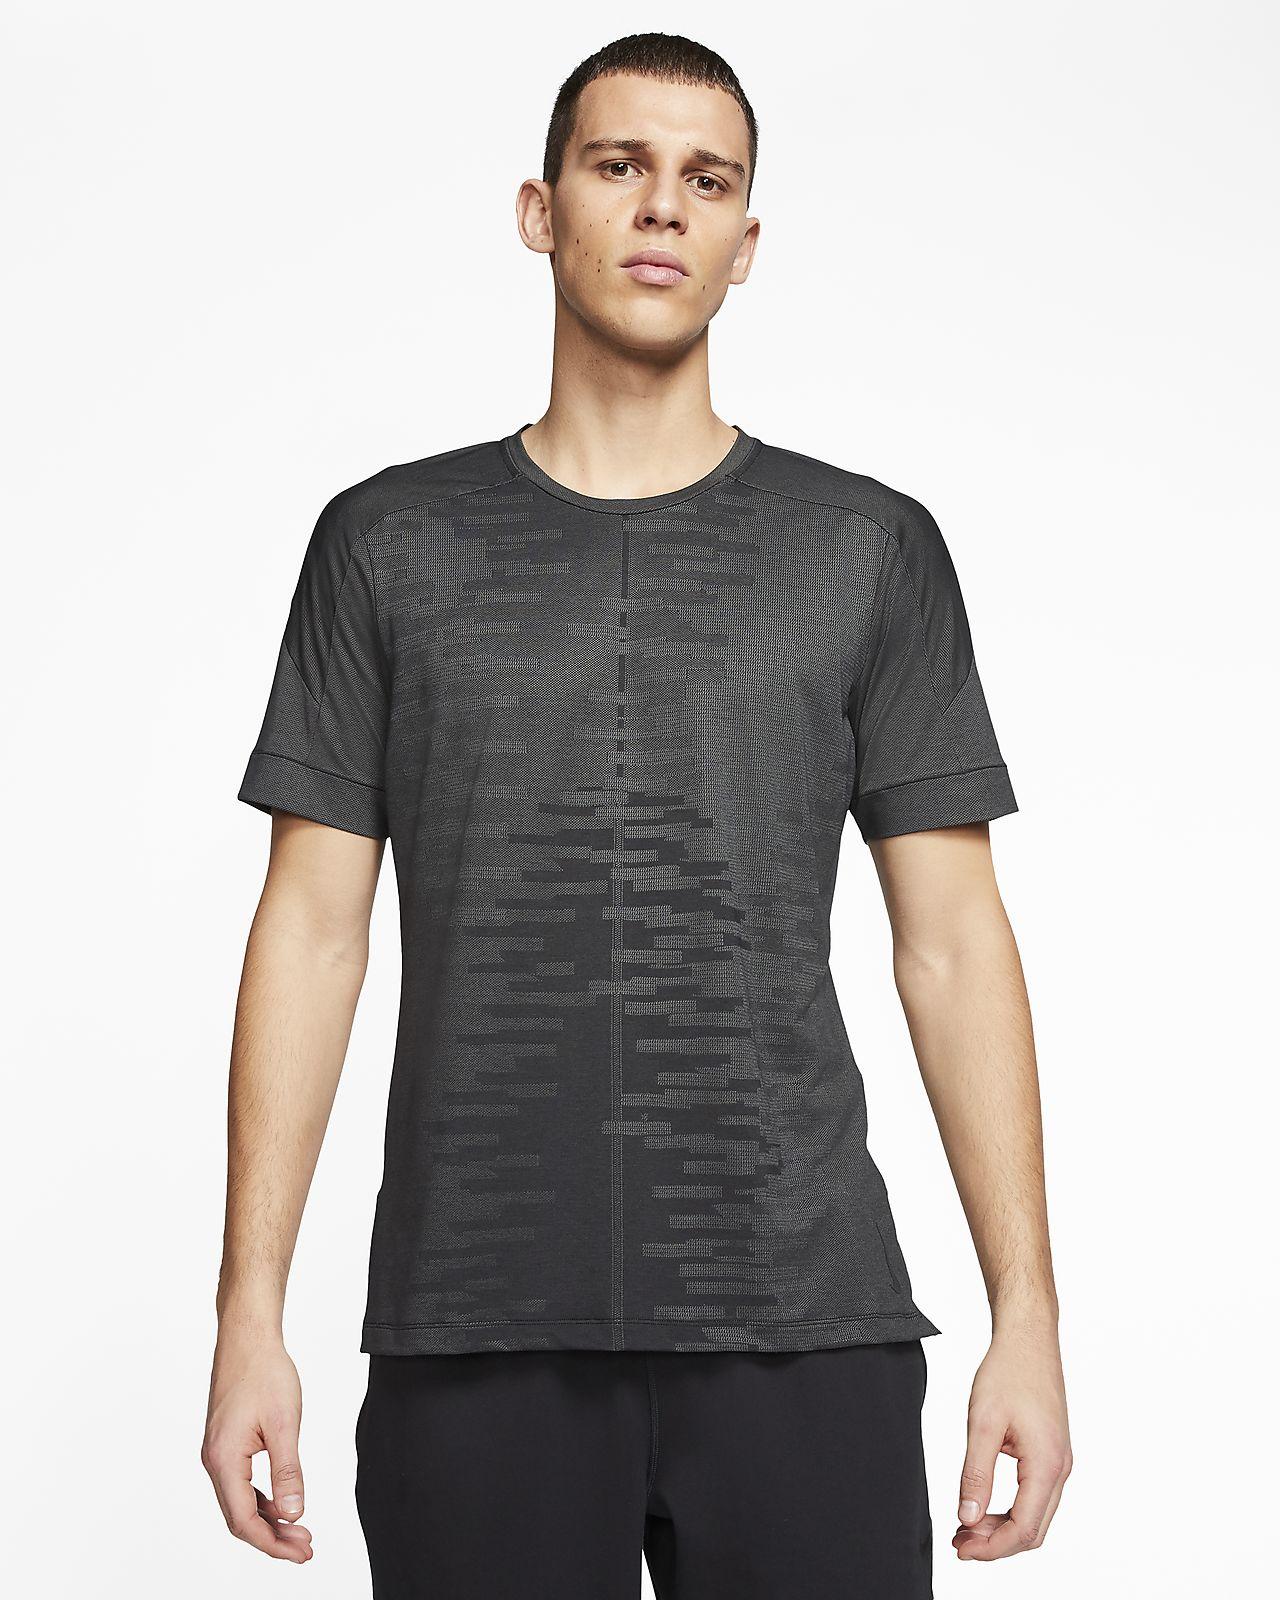 Nike Yoga Kurzarmshirt für Herren